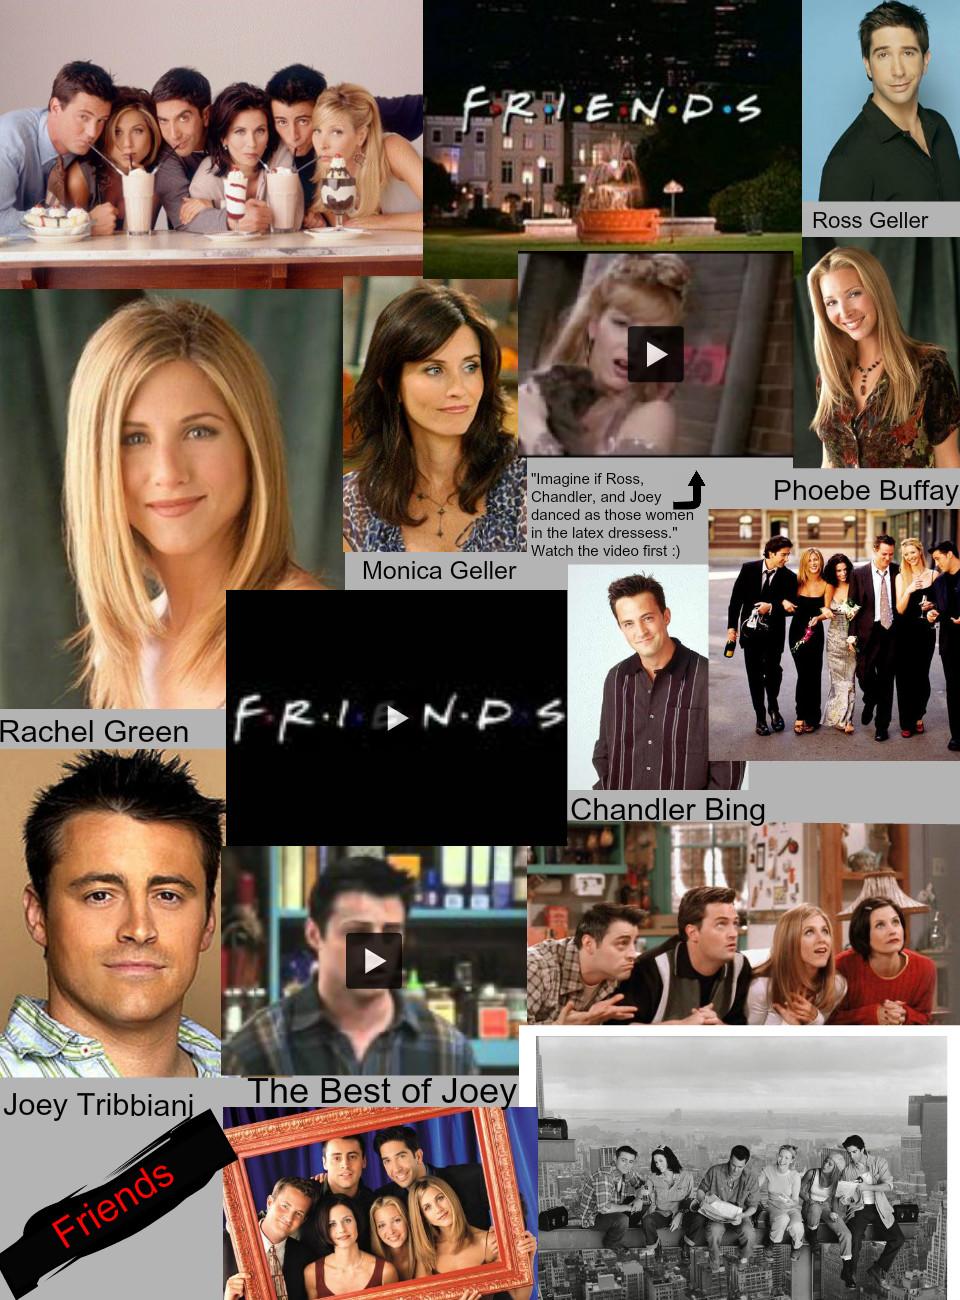 Tv Quotes About Friendship Friends Tv Show Wallpapers.friends Tv Show Wallpaperskeep Calm